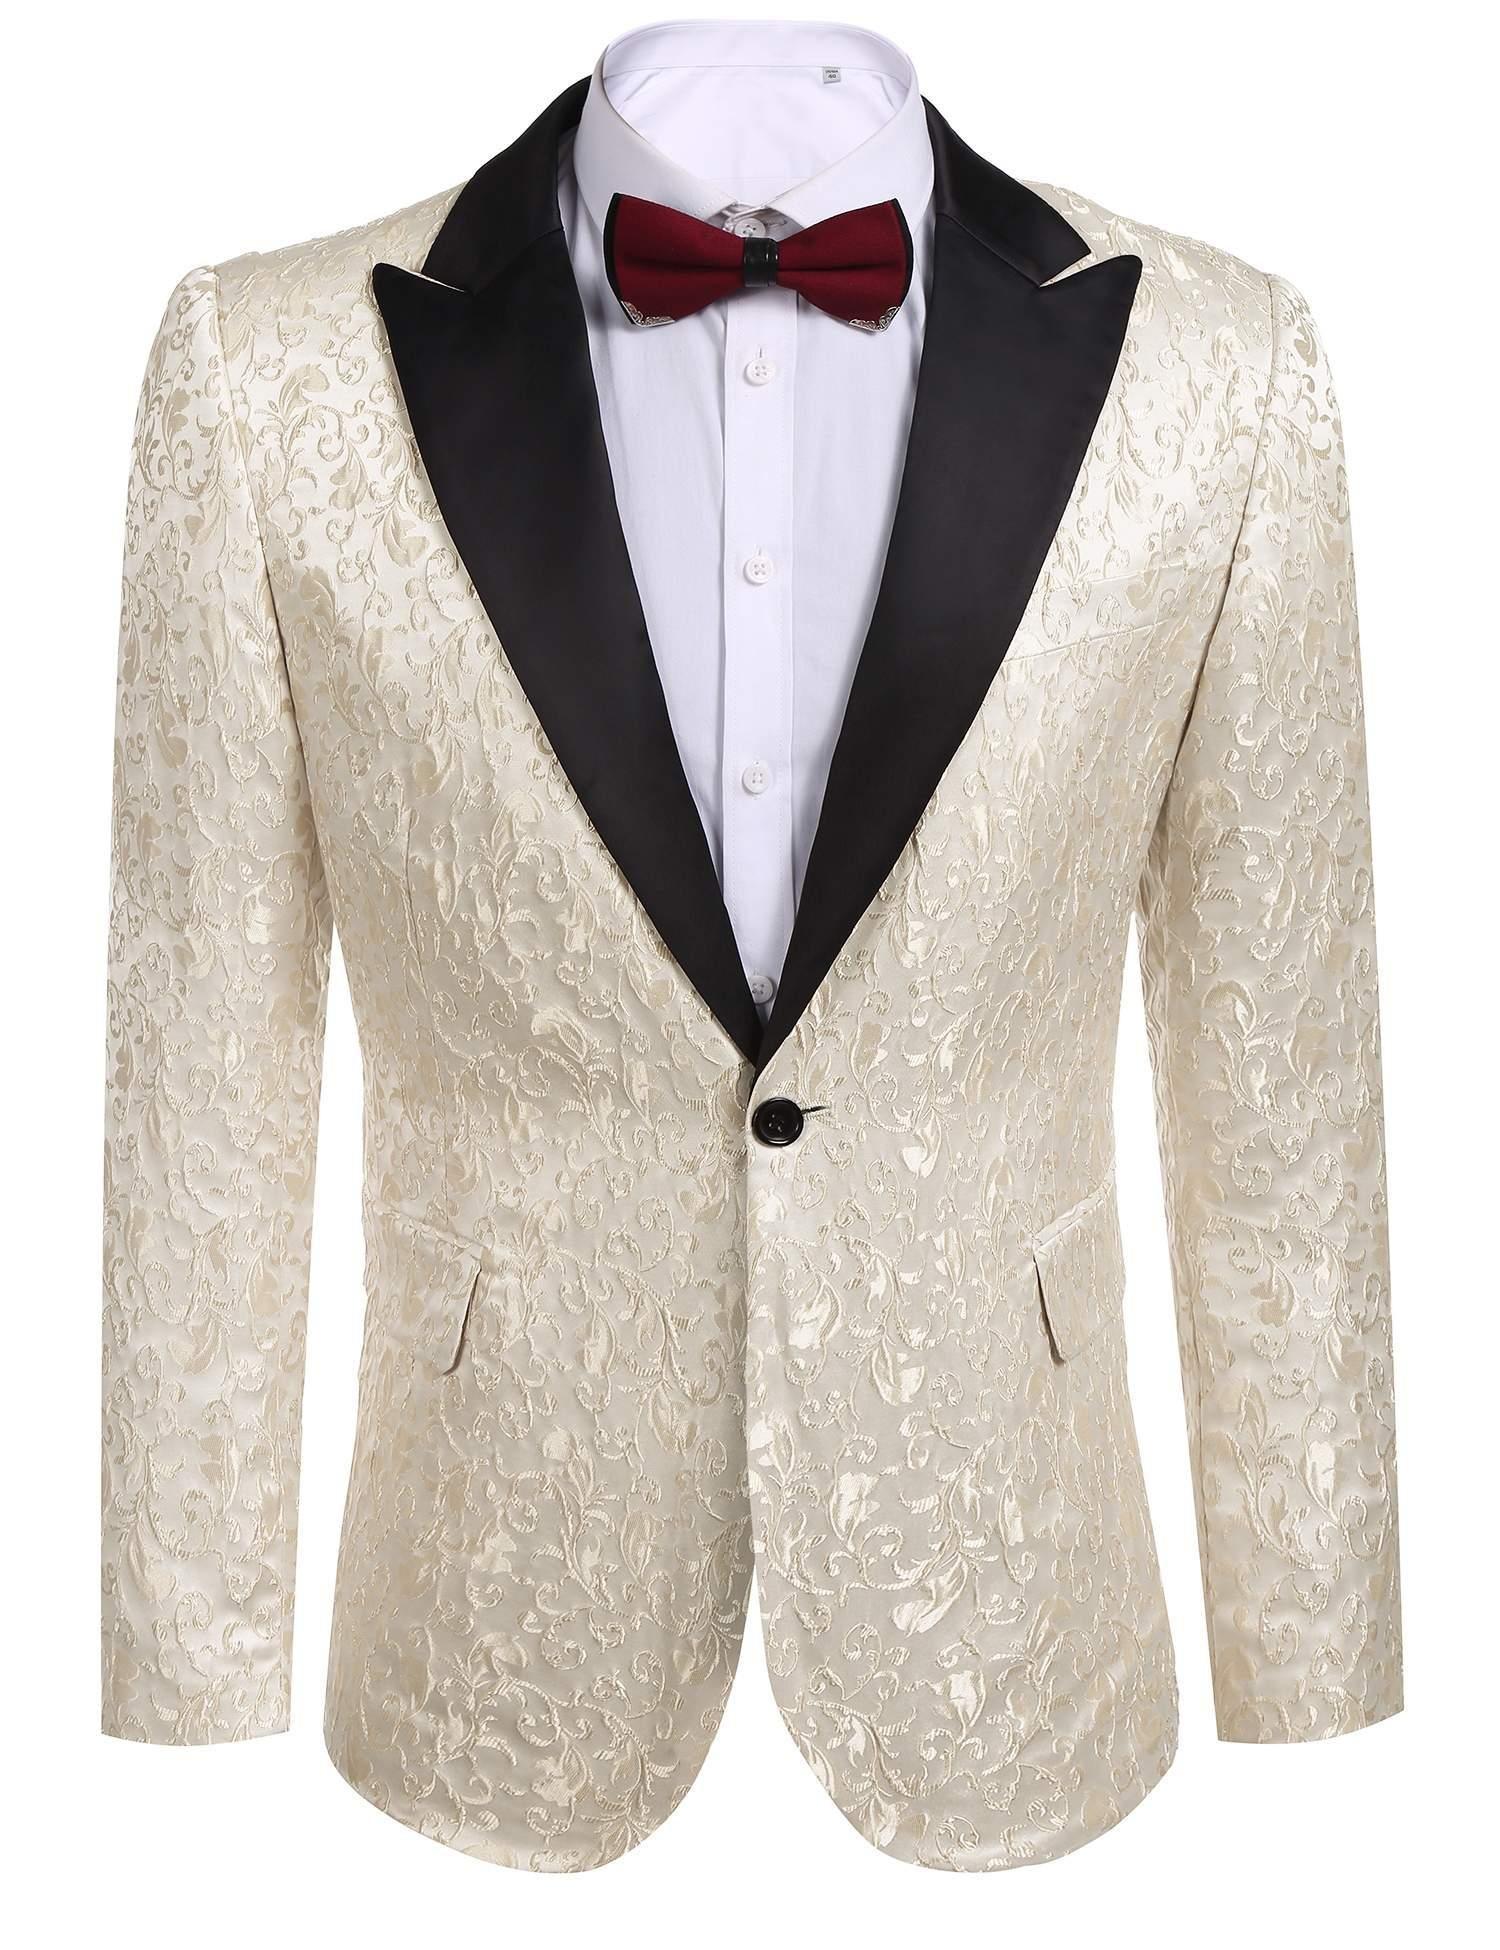 COOFANDY Men's Floral Party Dress Suit Stylish Dinner Jacket Wedding Blazer One Button Tuxdeo